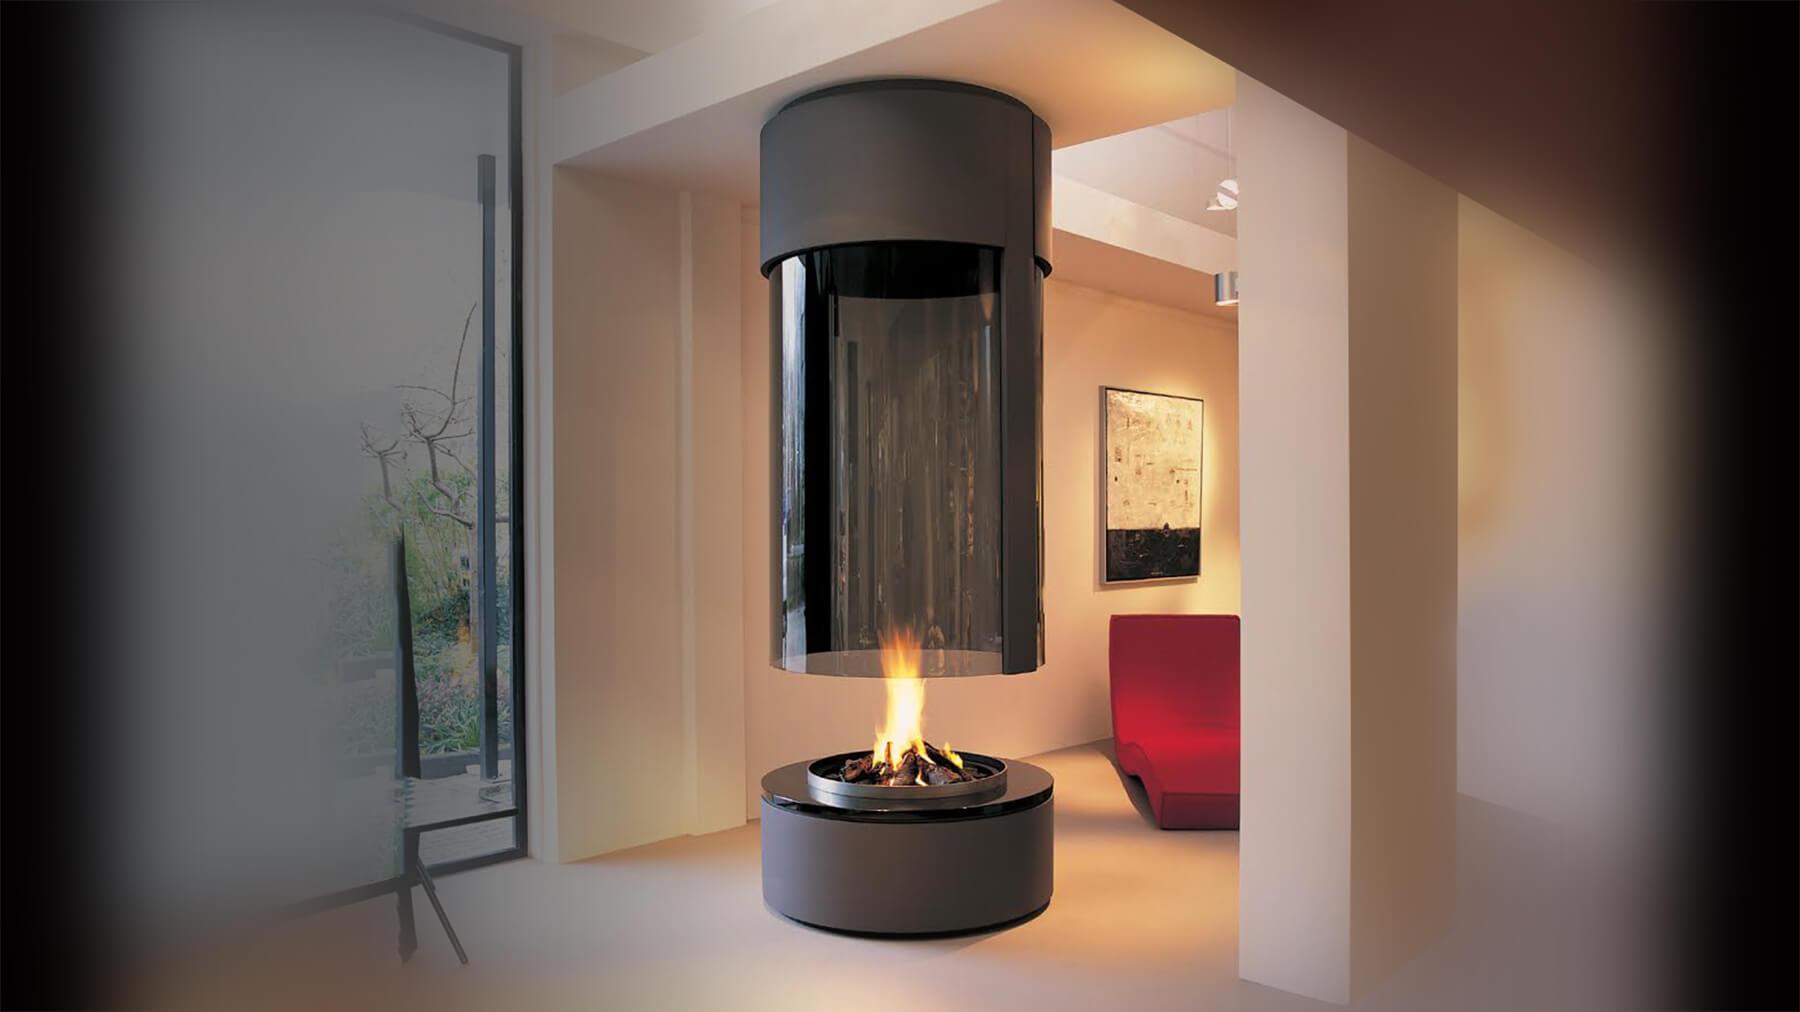 exquisitely designed circular gas fires